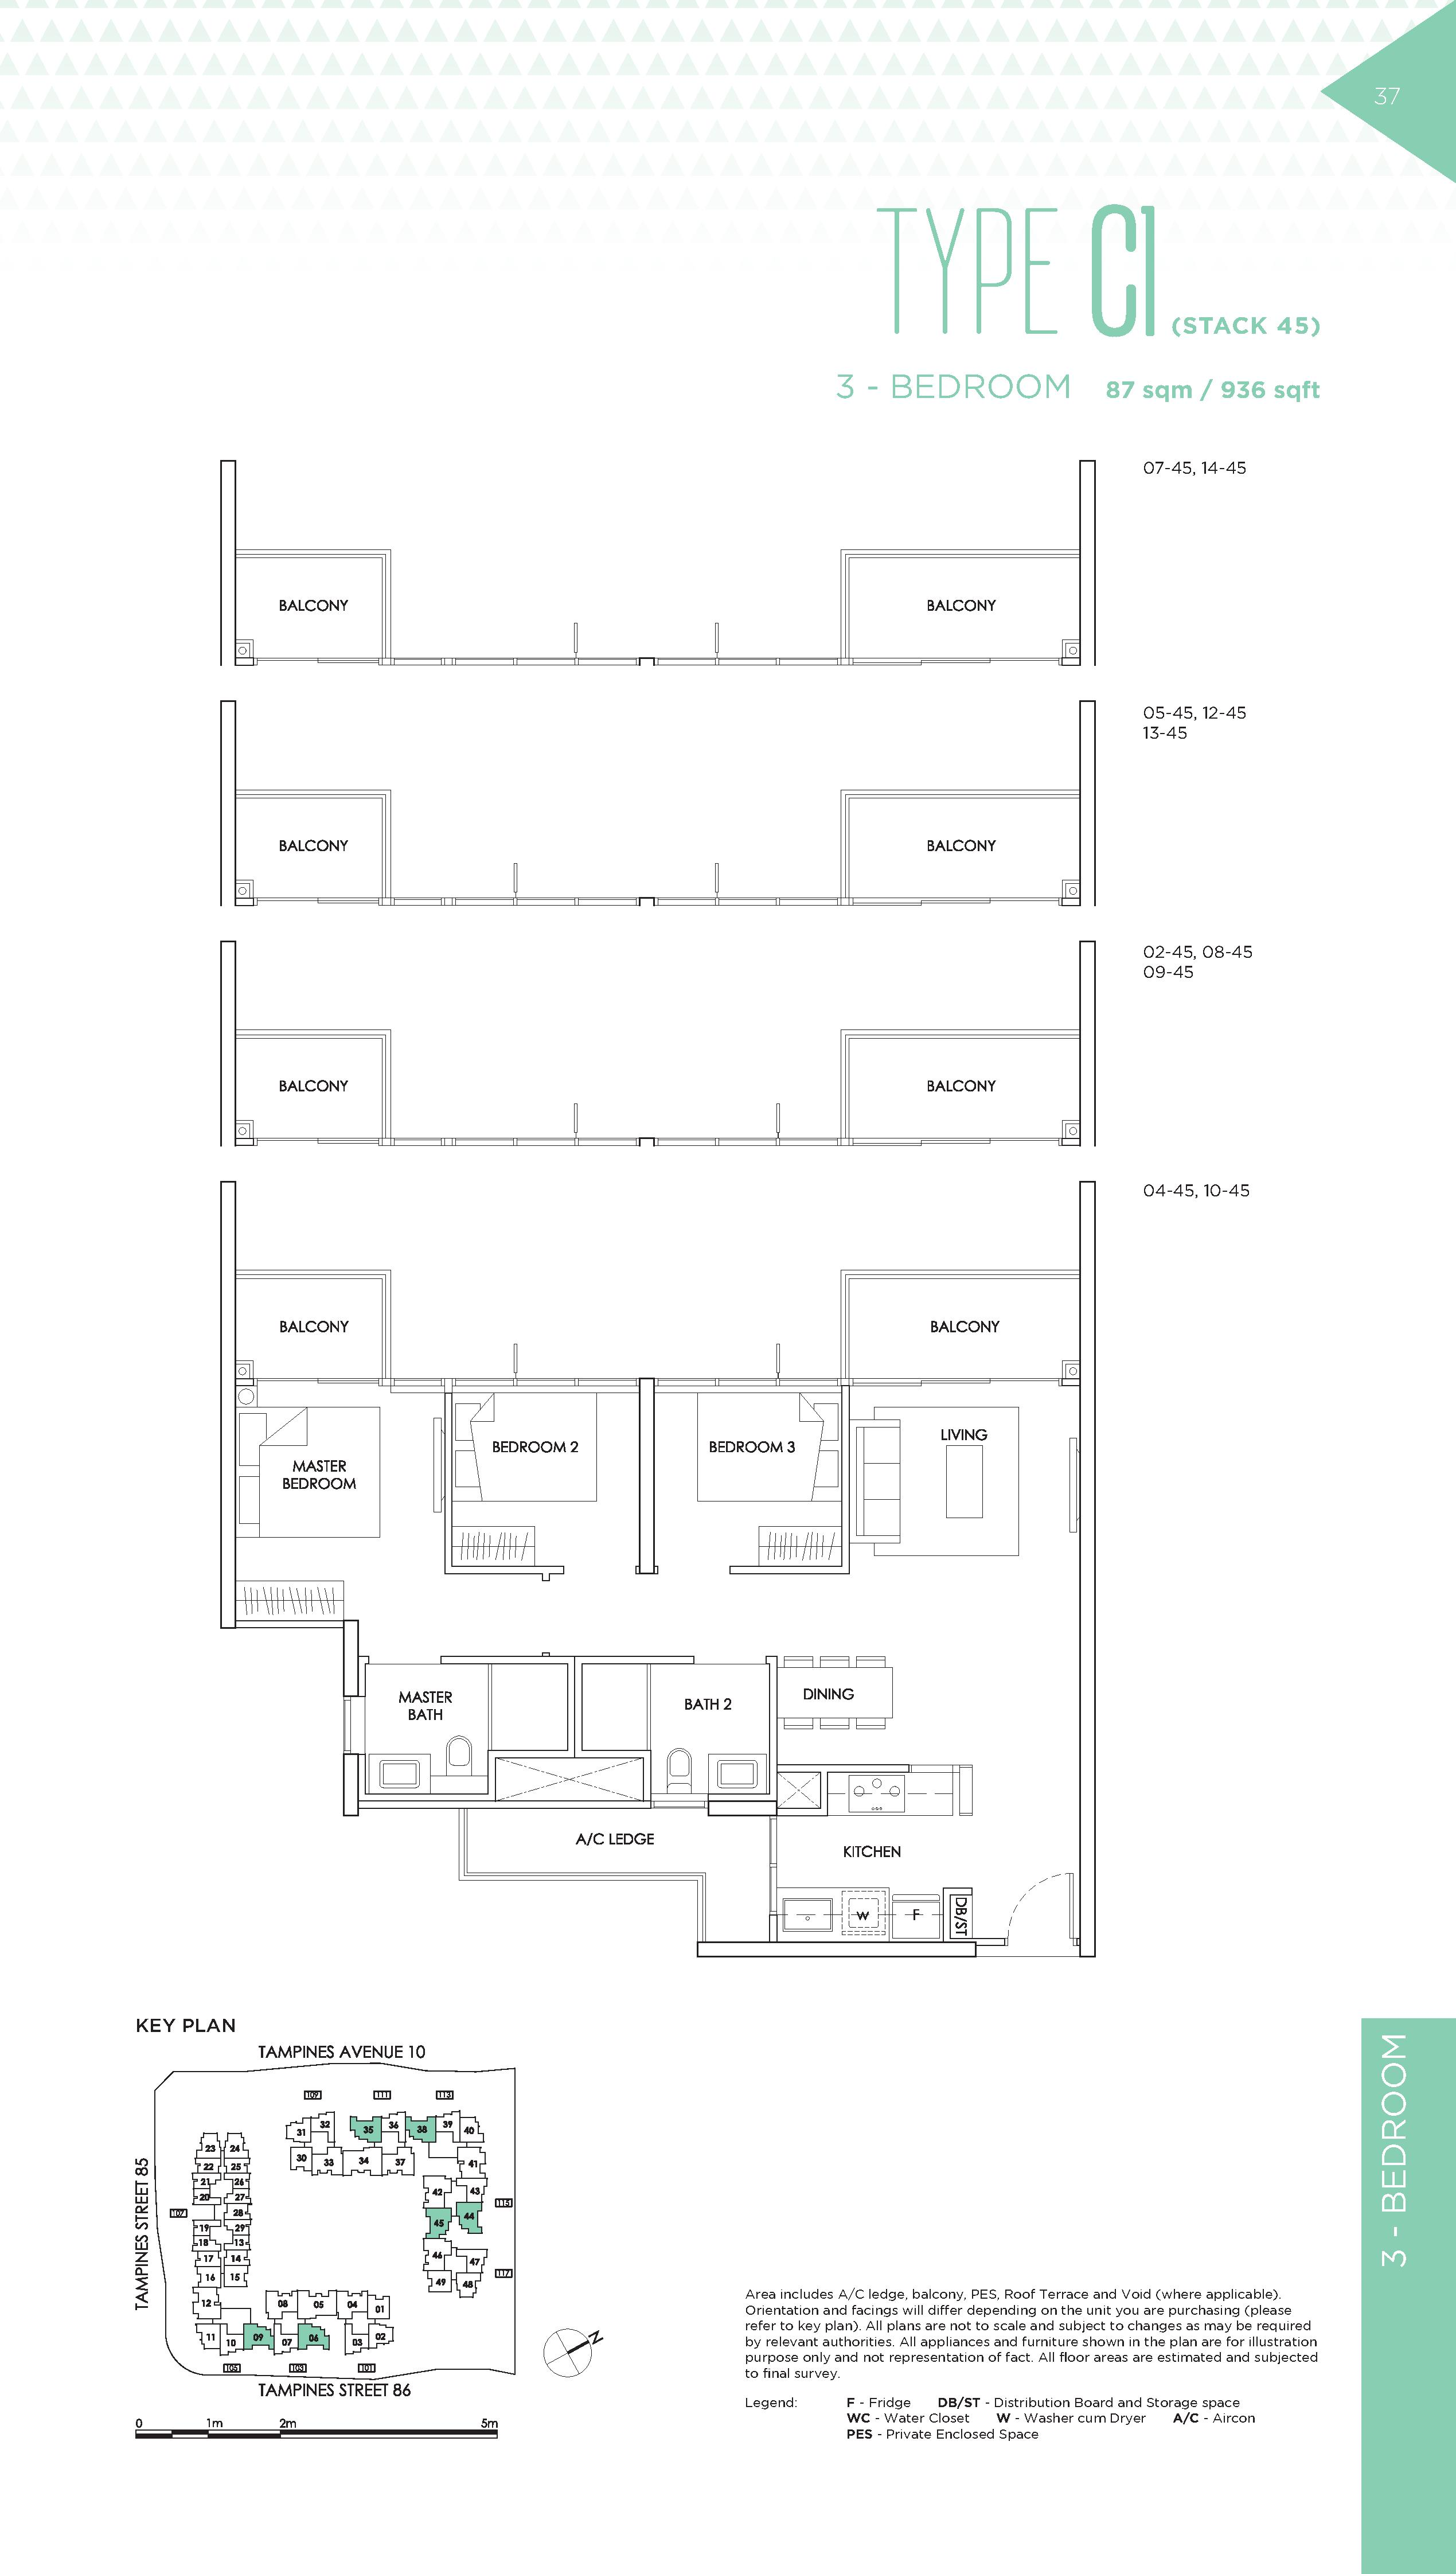 The Alps Residences 3 Bedroom Floor Plans Type C1(Stack 45)